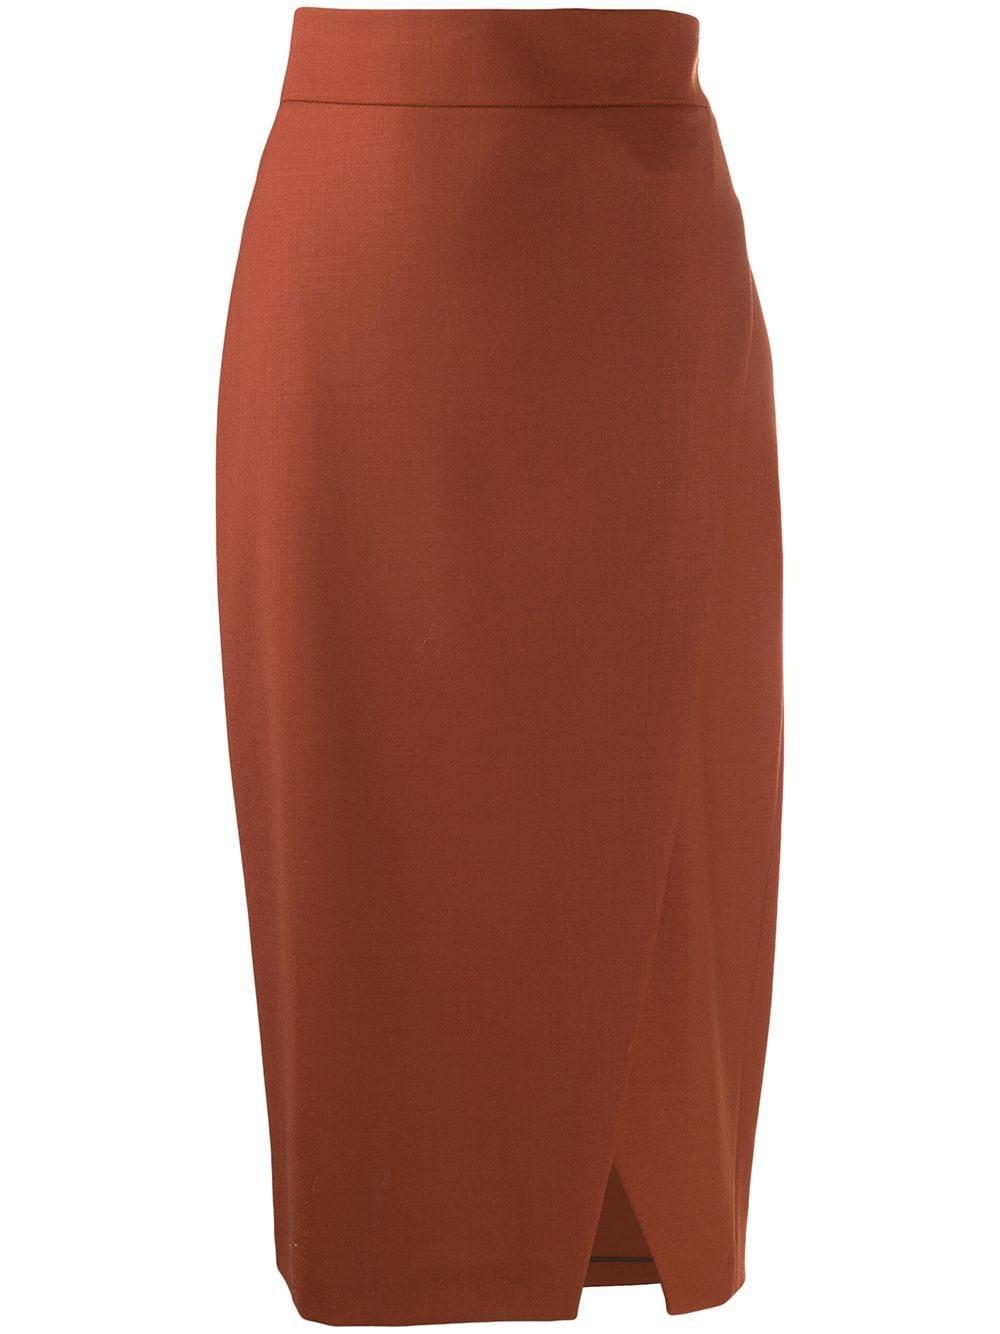 Antonelli юбка-карандаш с драпировкой